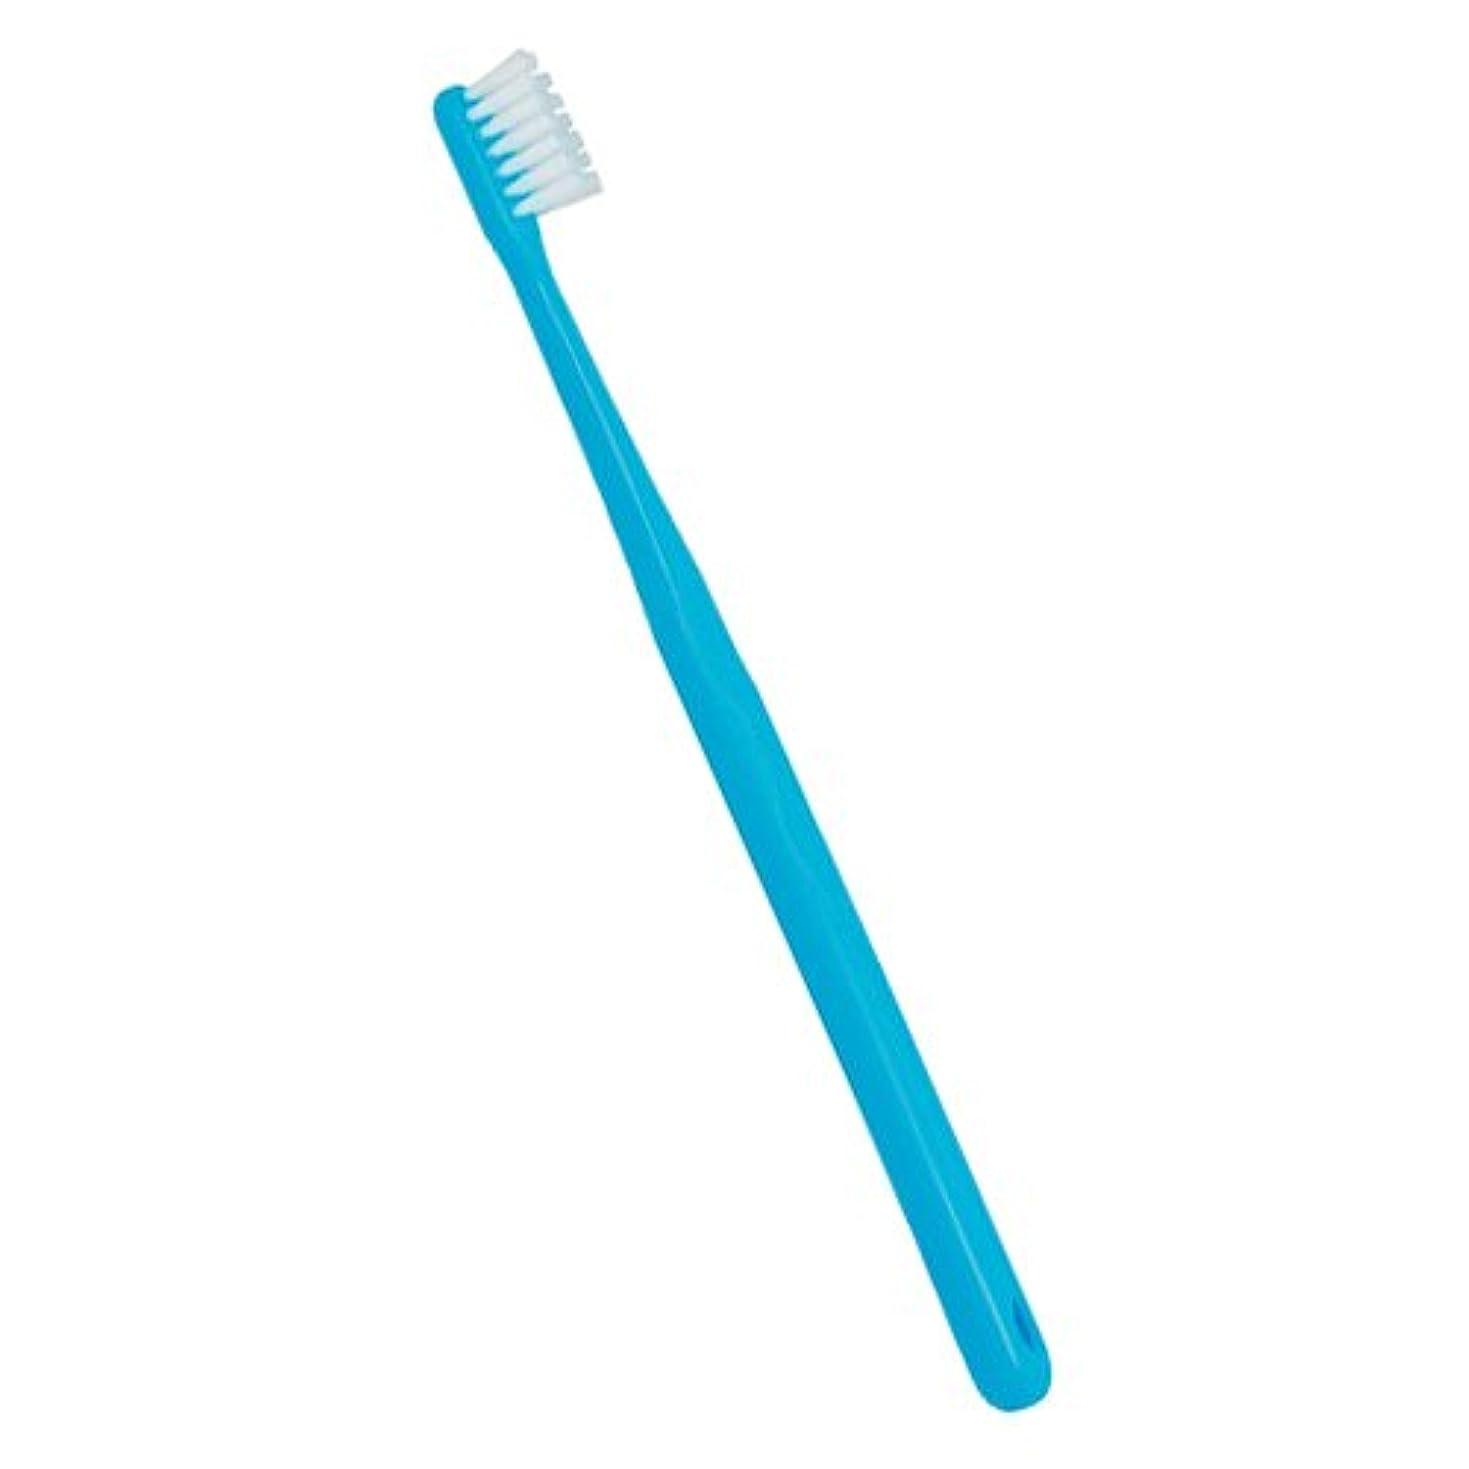 Ciメディカル 歯ブラシ Ci702(フラットタイプ) 1本(M ふつう(ブルー))